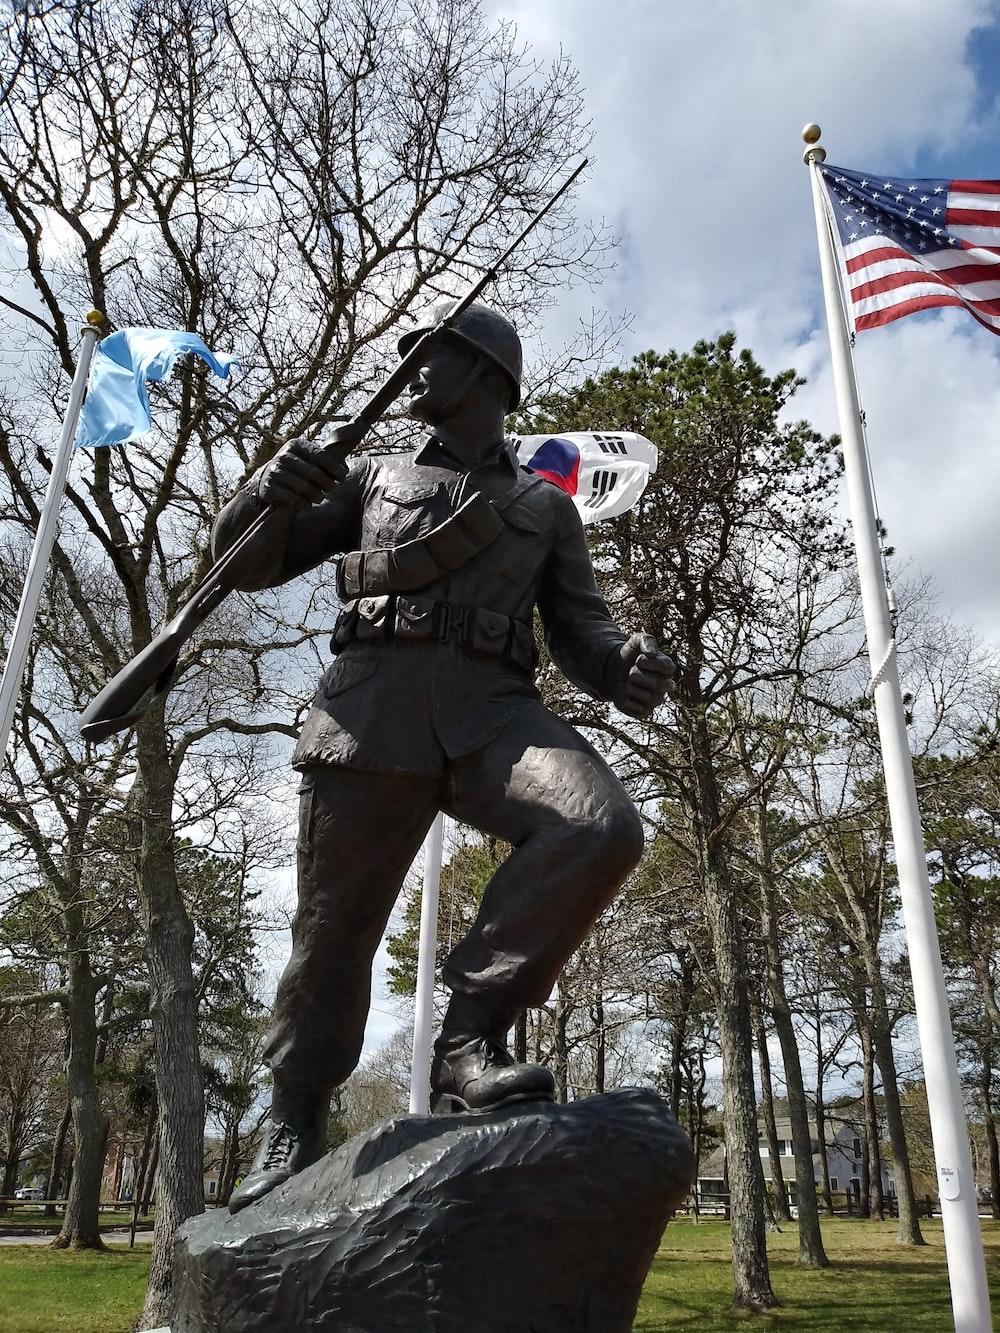 man in black helmet and black jacket holding flag of us a during daytime